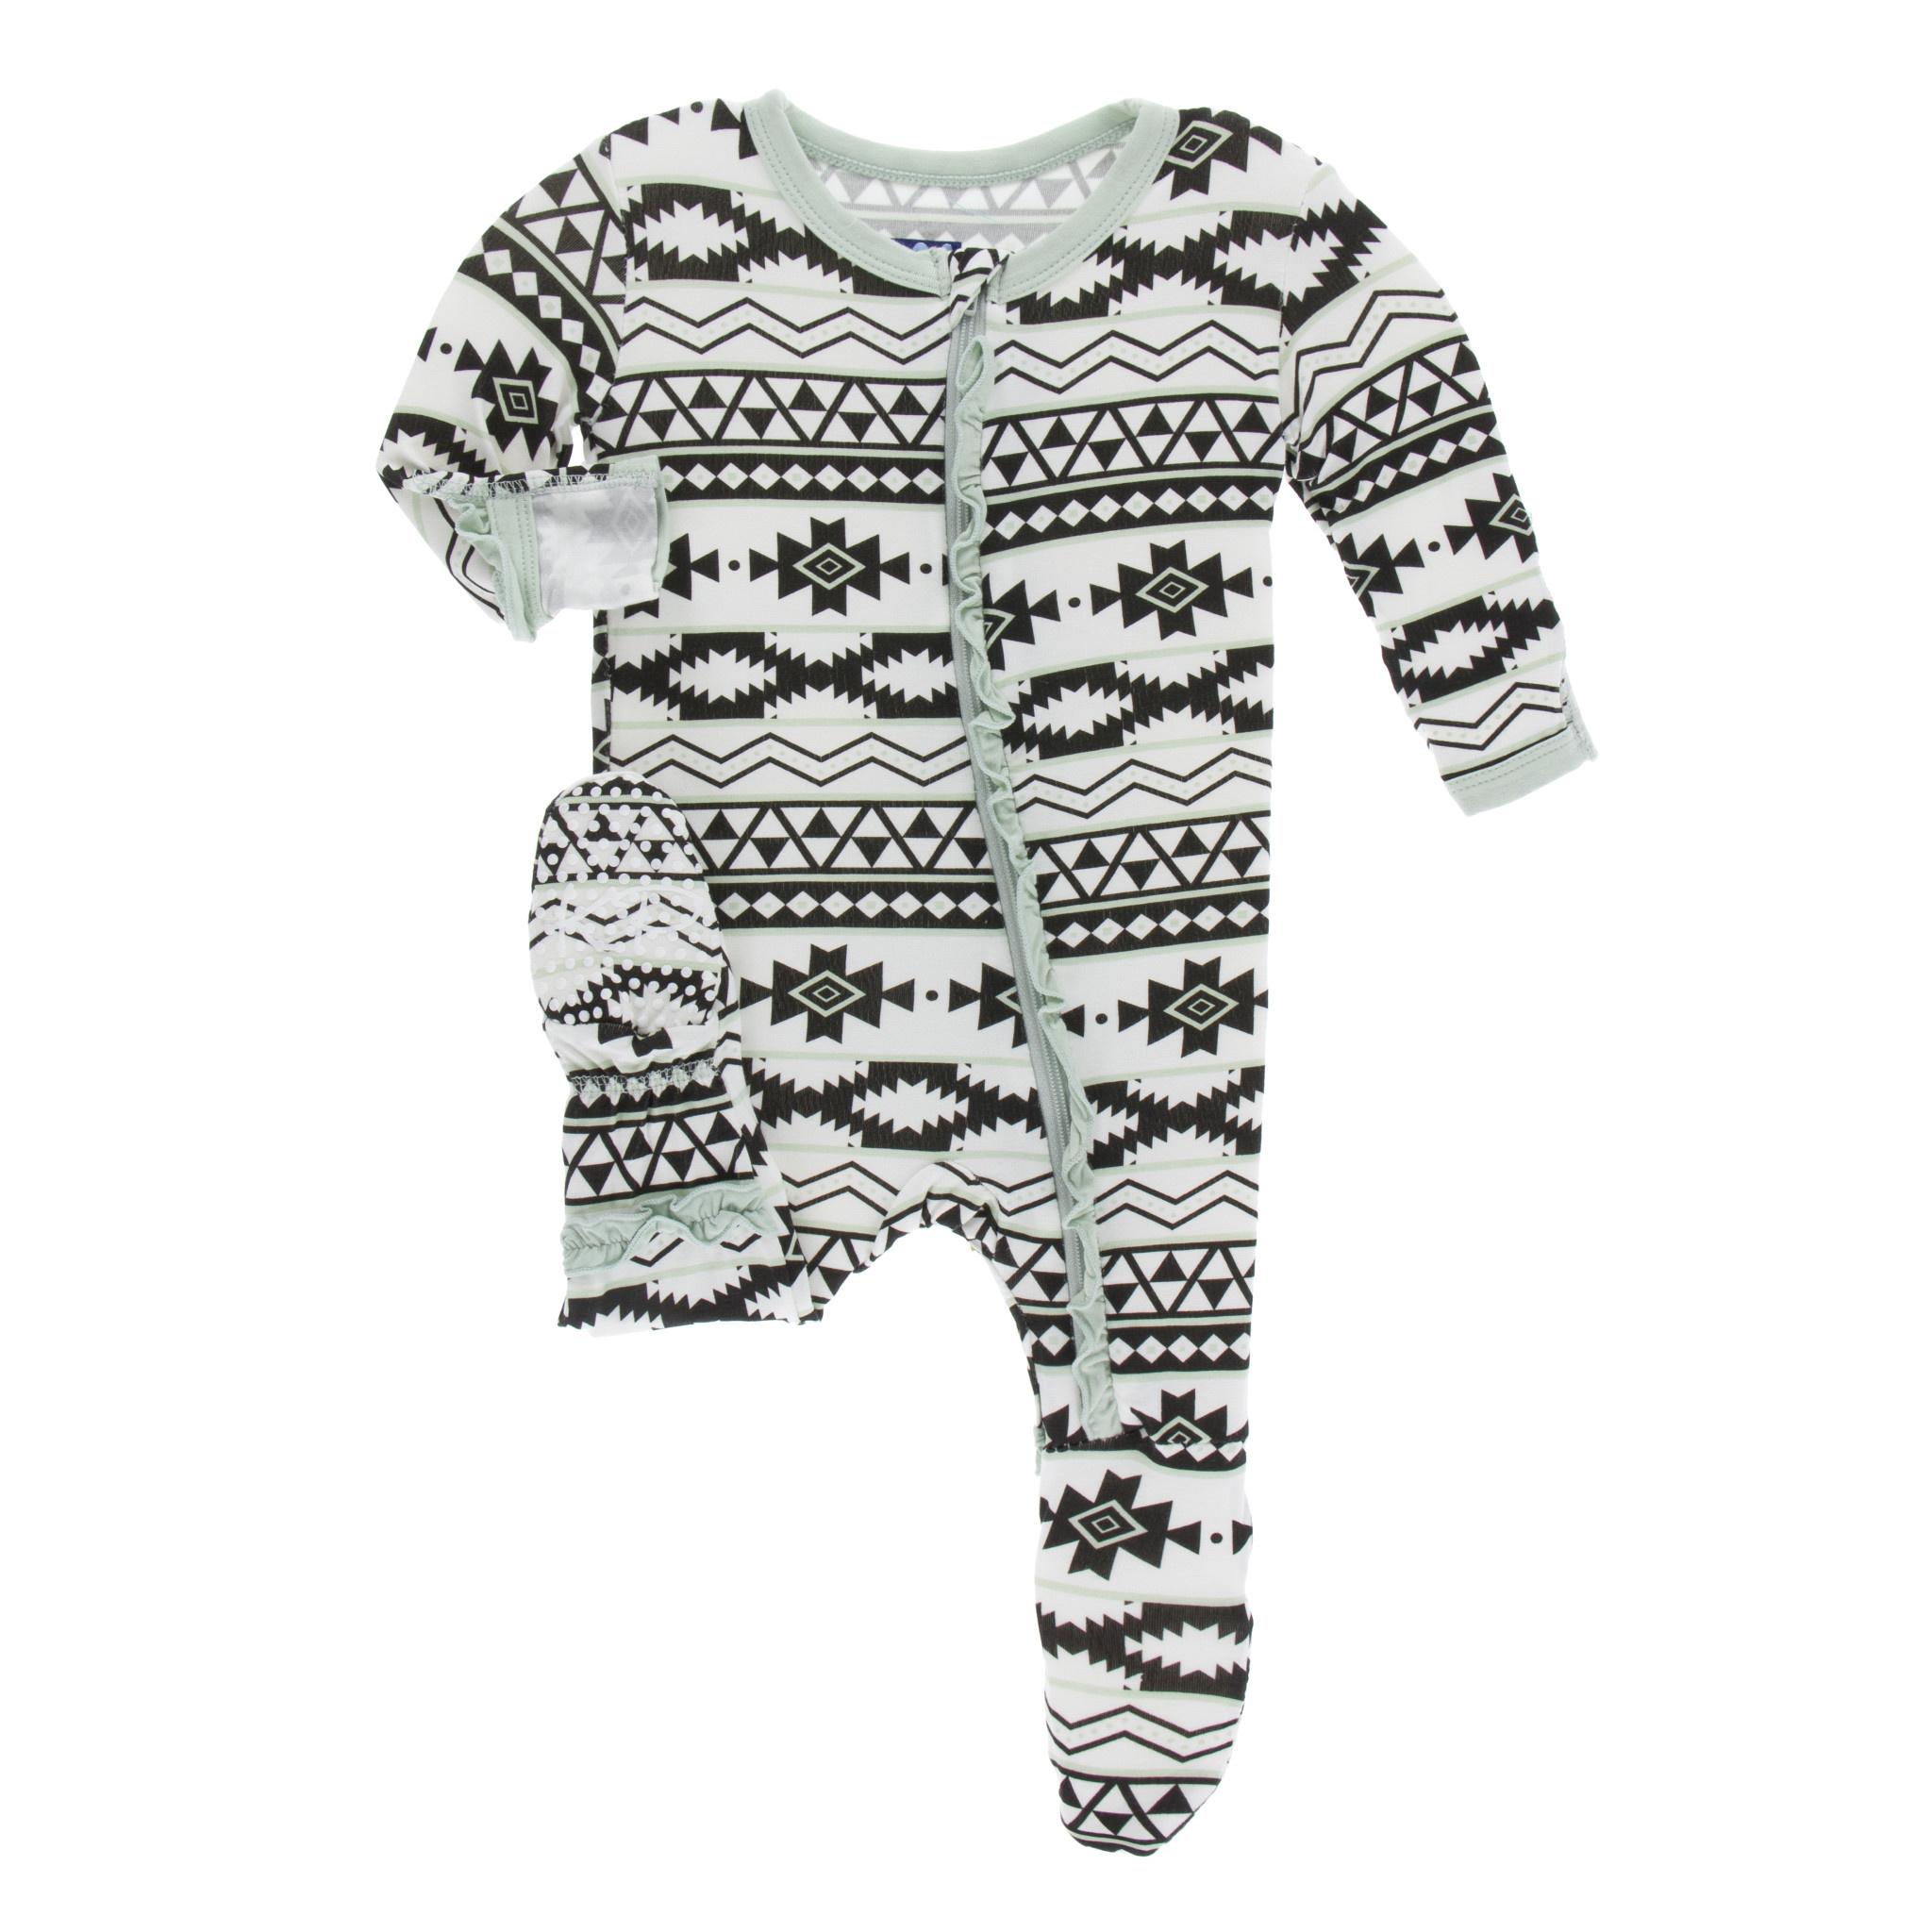 ab6da30c0 Kickee Pants Print Footie with Zipper Natural Mayan Pattern - Kicks ...